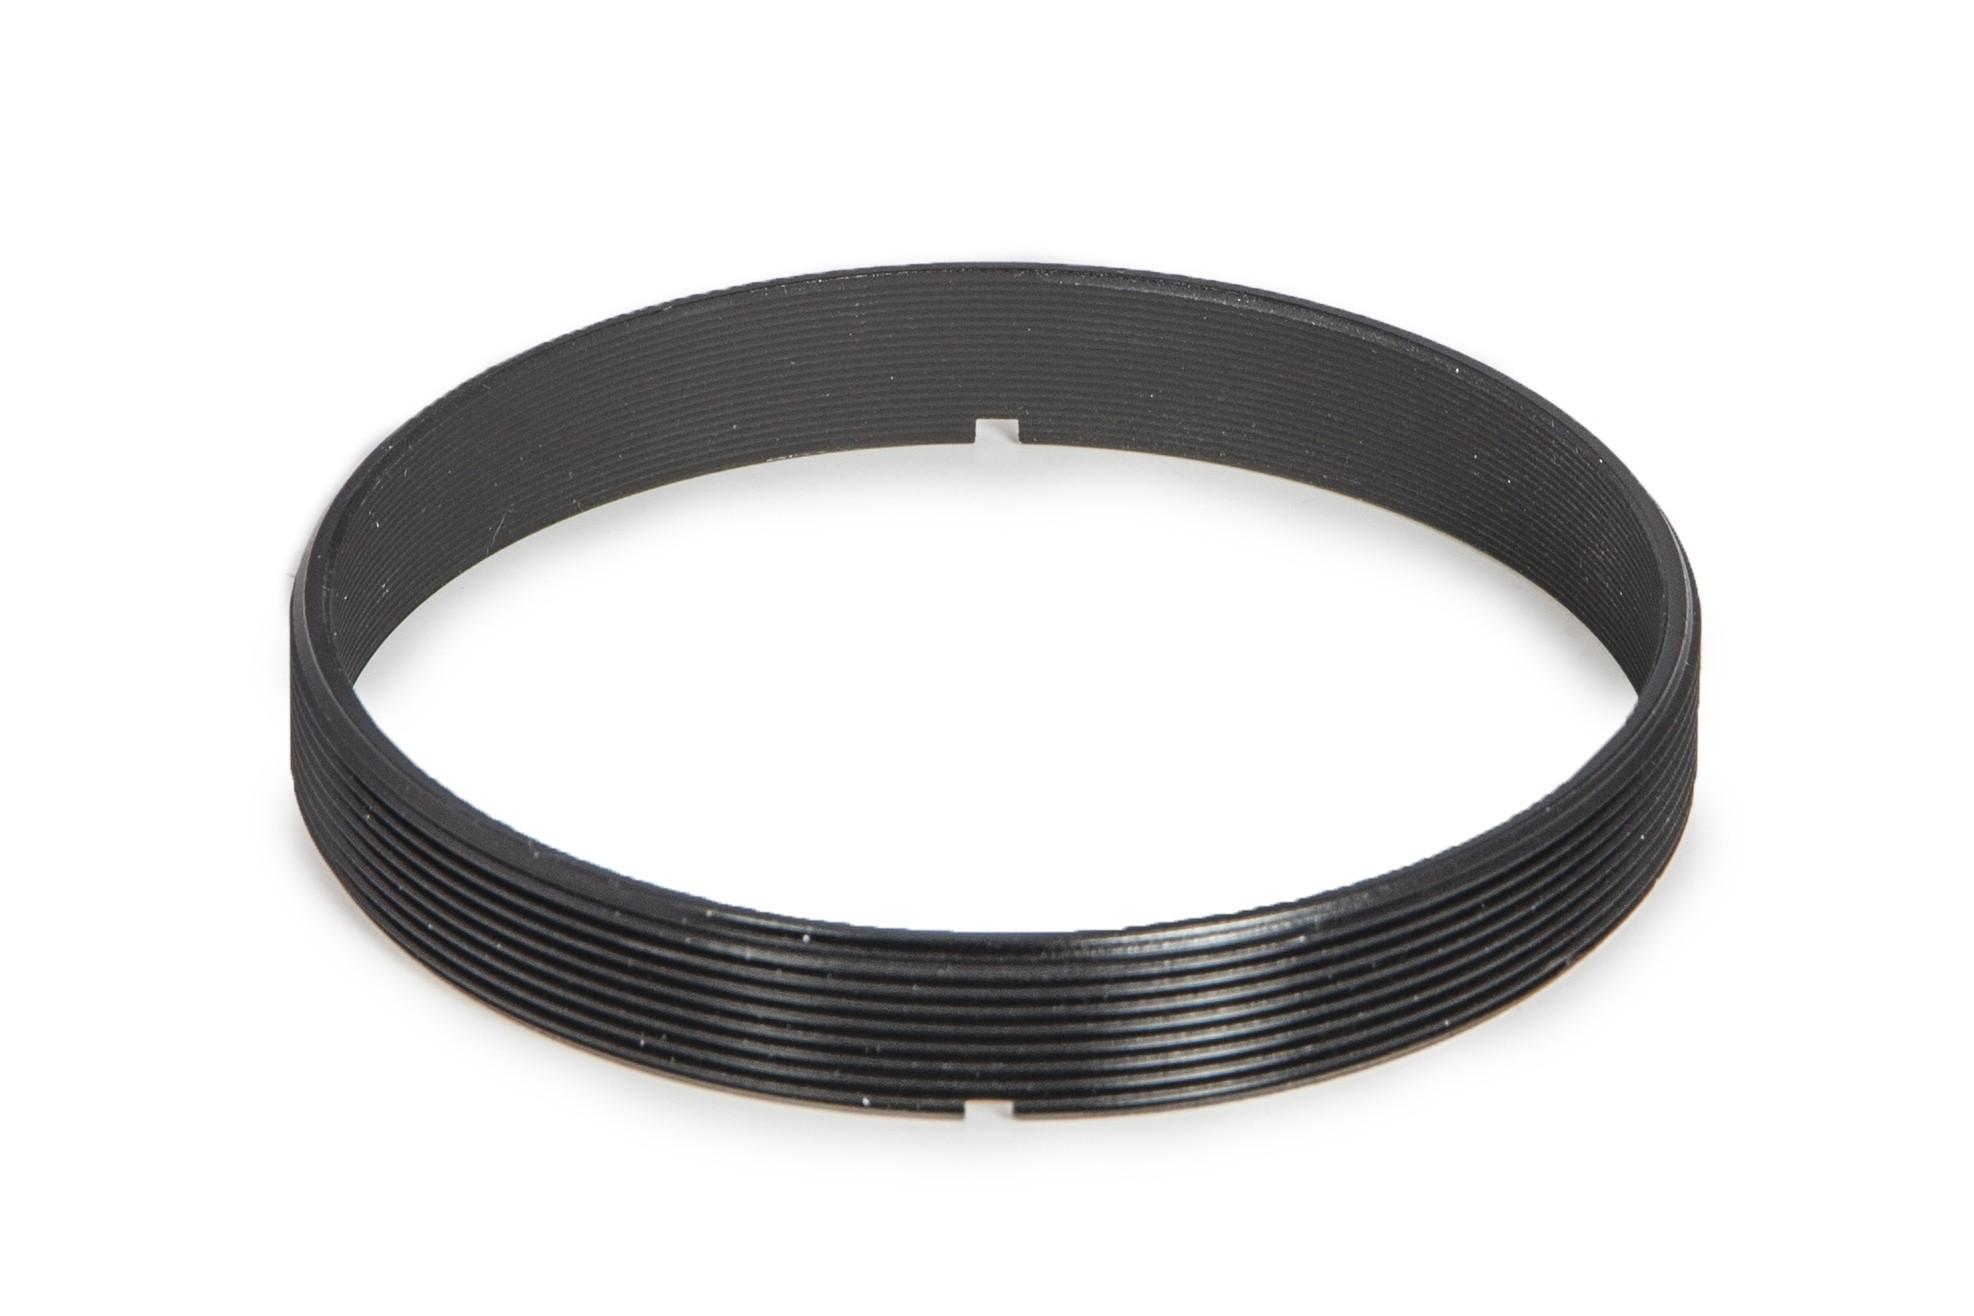 Baader M68 a/i Conversion Ring